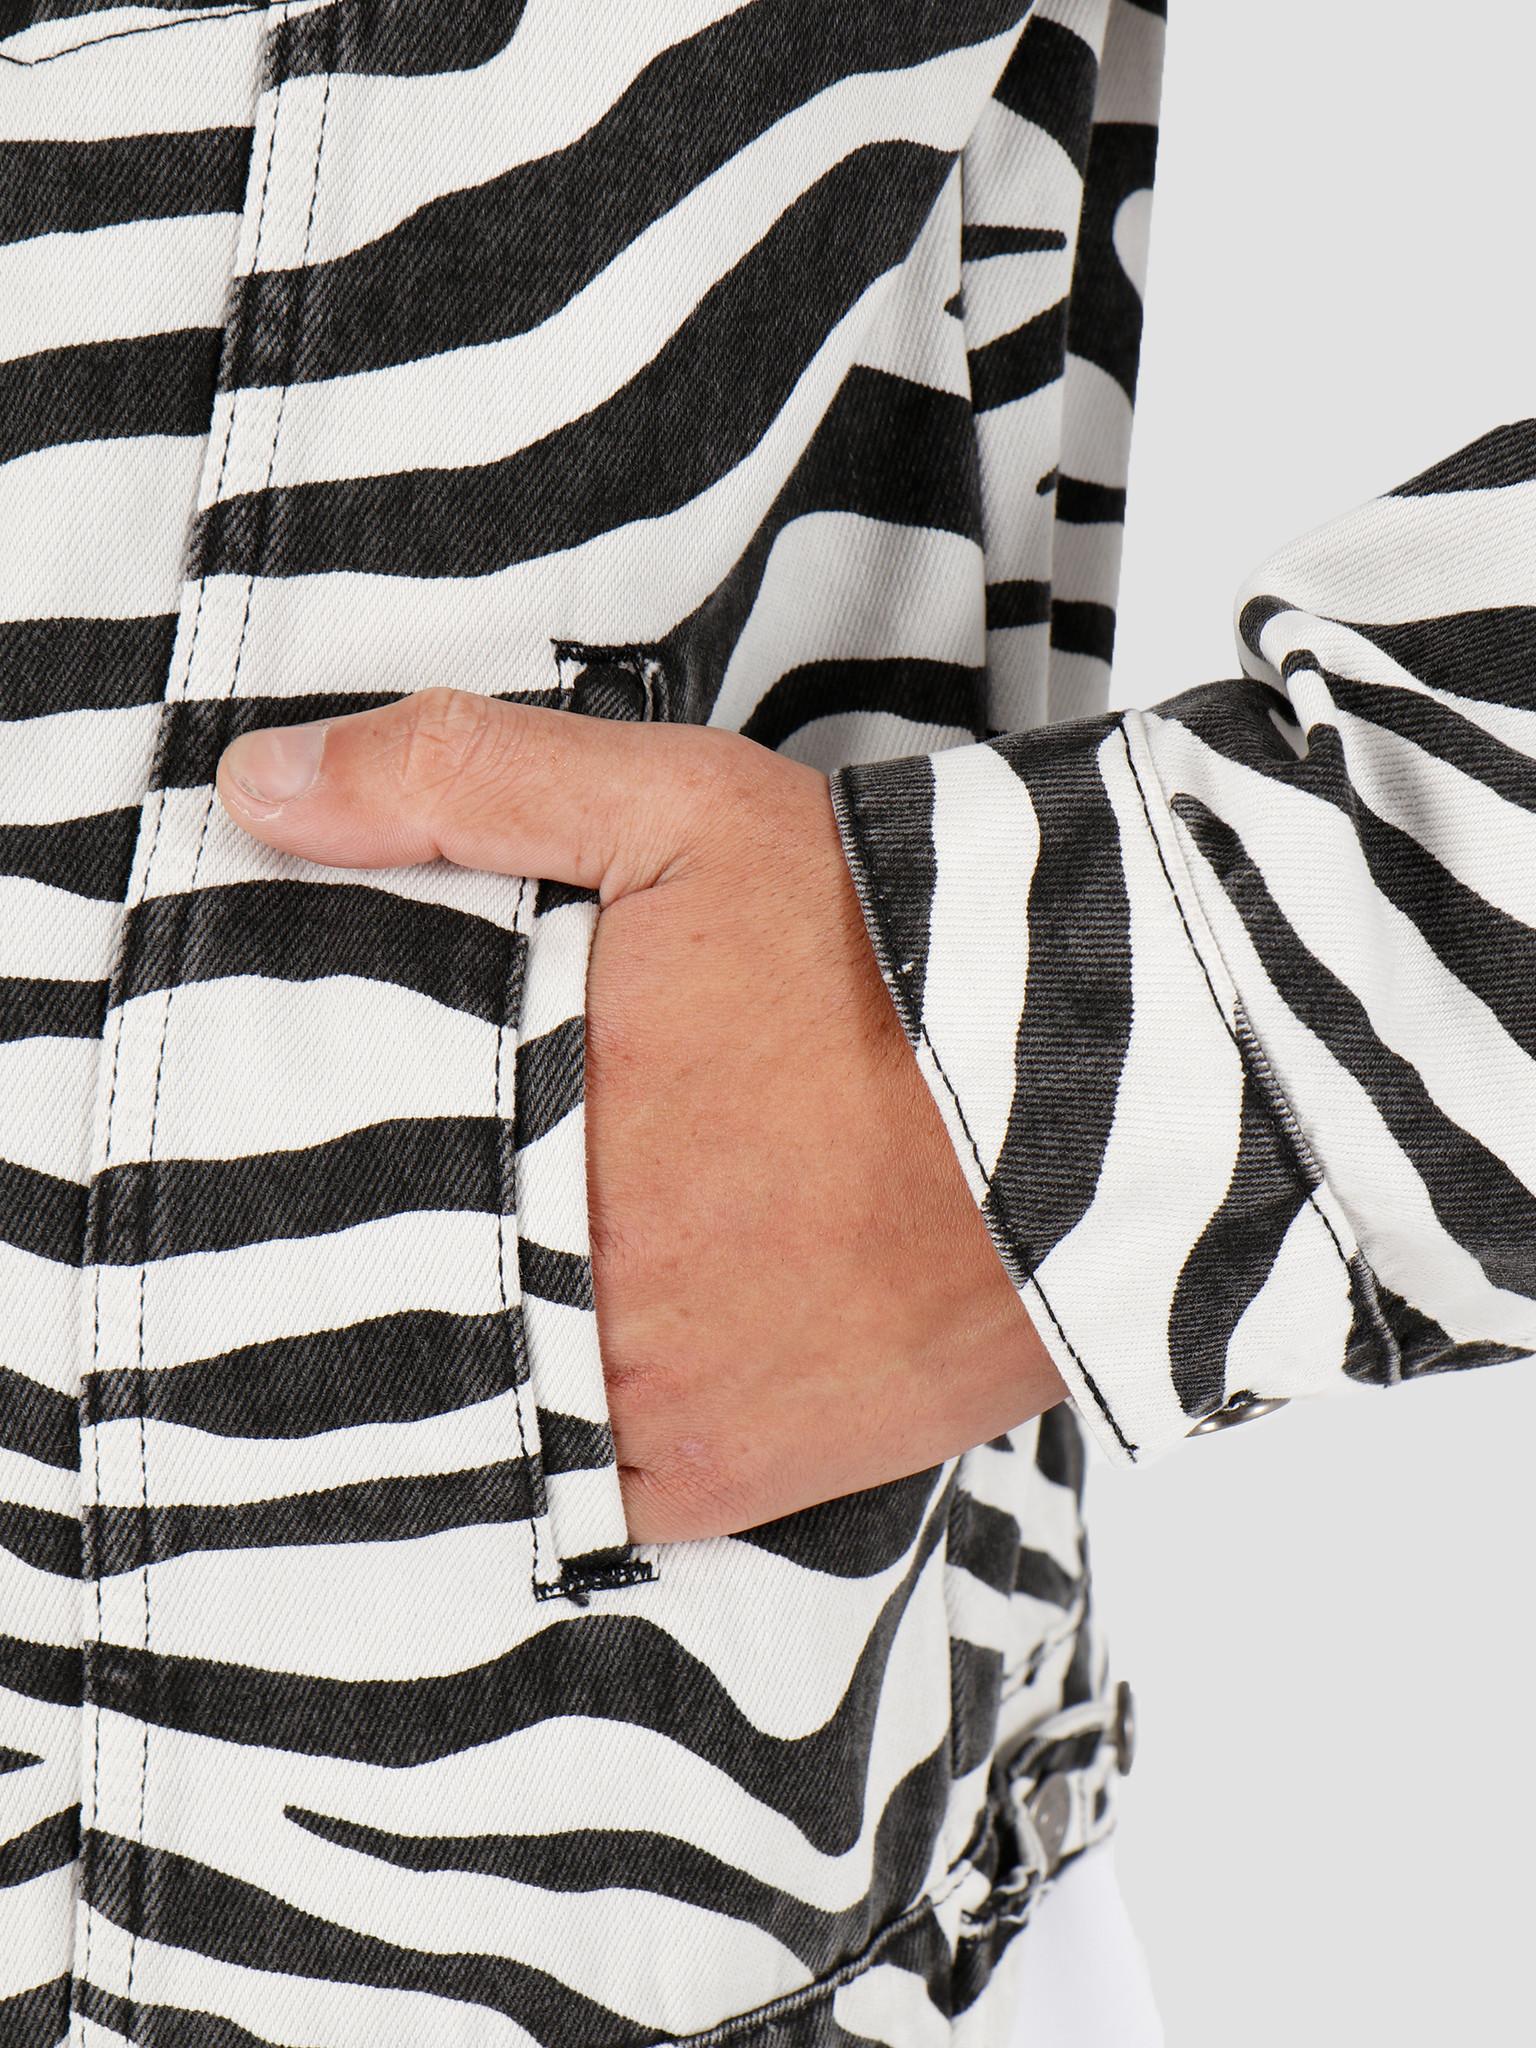 Daily Paper Daily Paper Hajean Outerwear Zebra Denim 20S1OU07-01